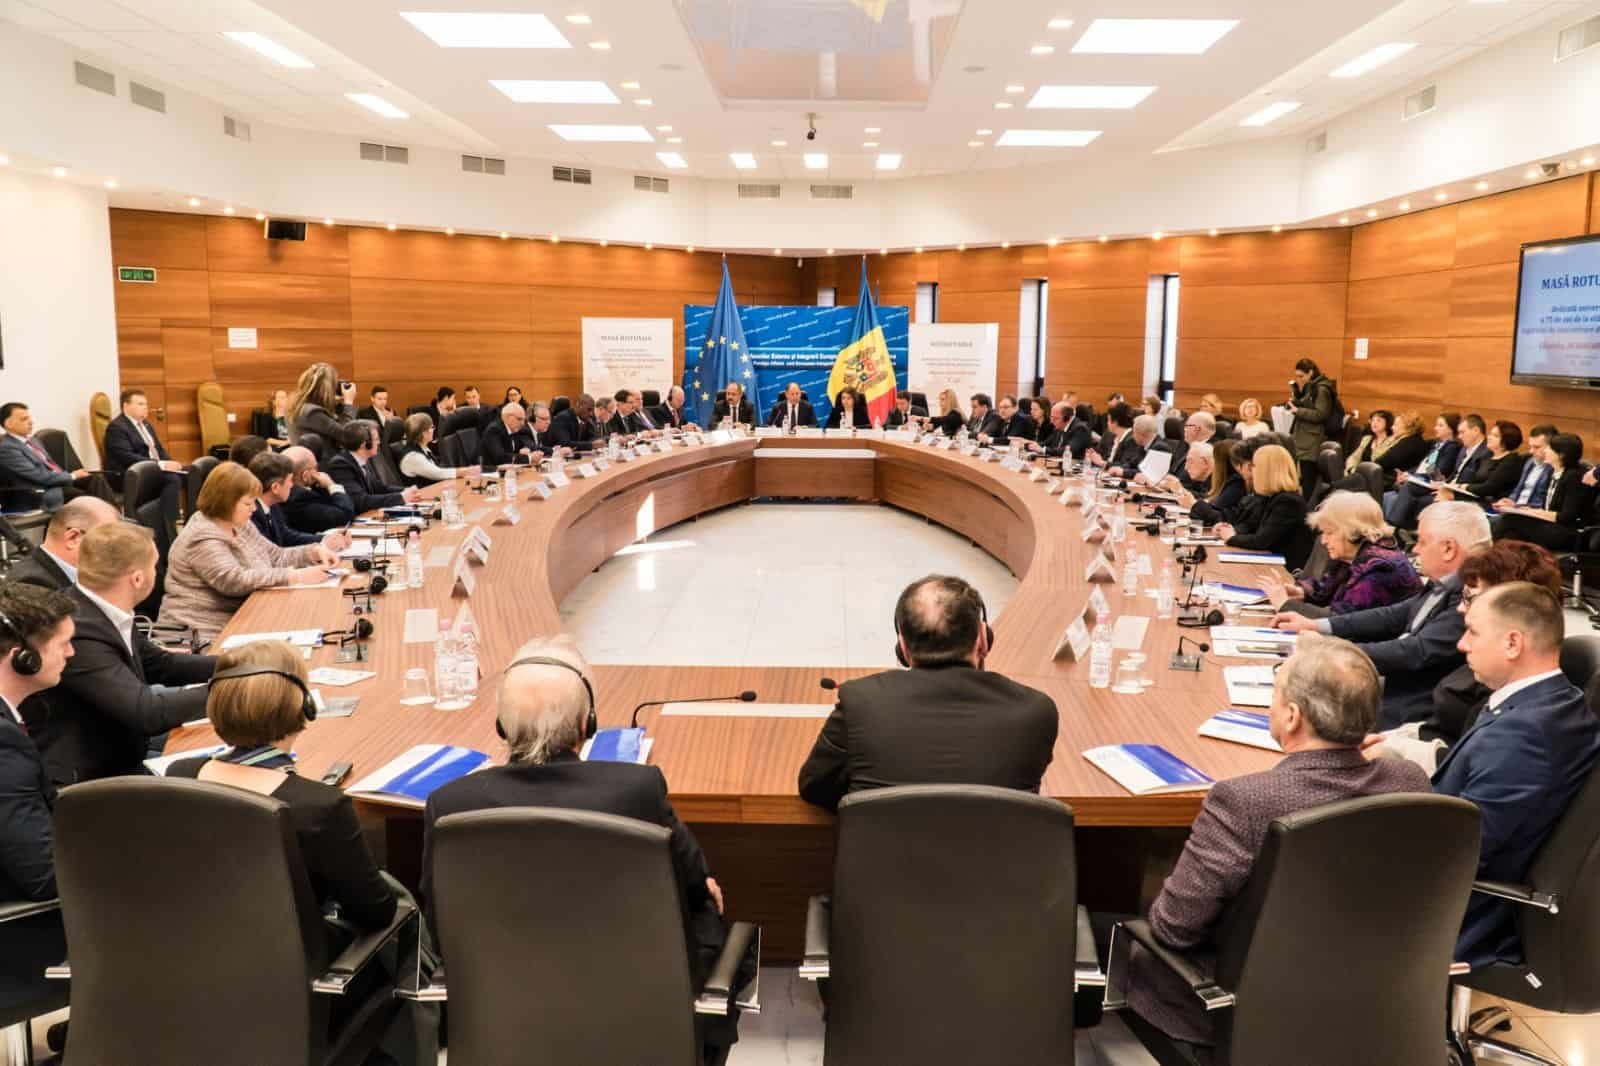 Kонференции по правам человека и борьбе с антисемитизмом